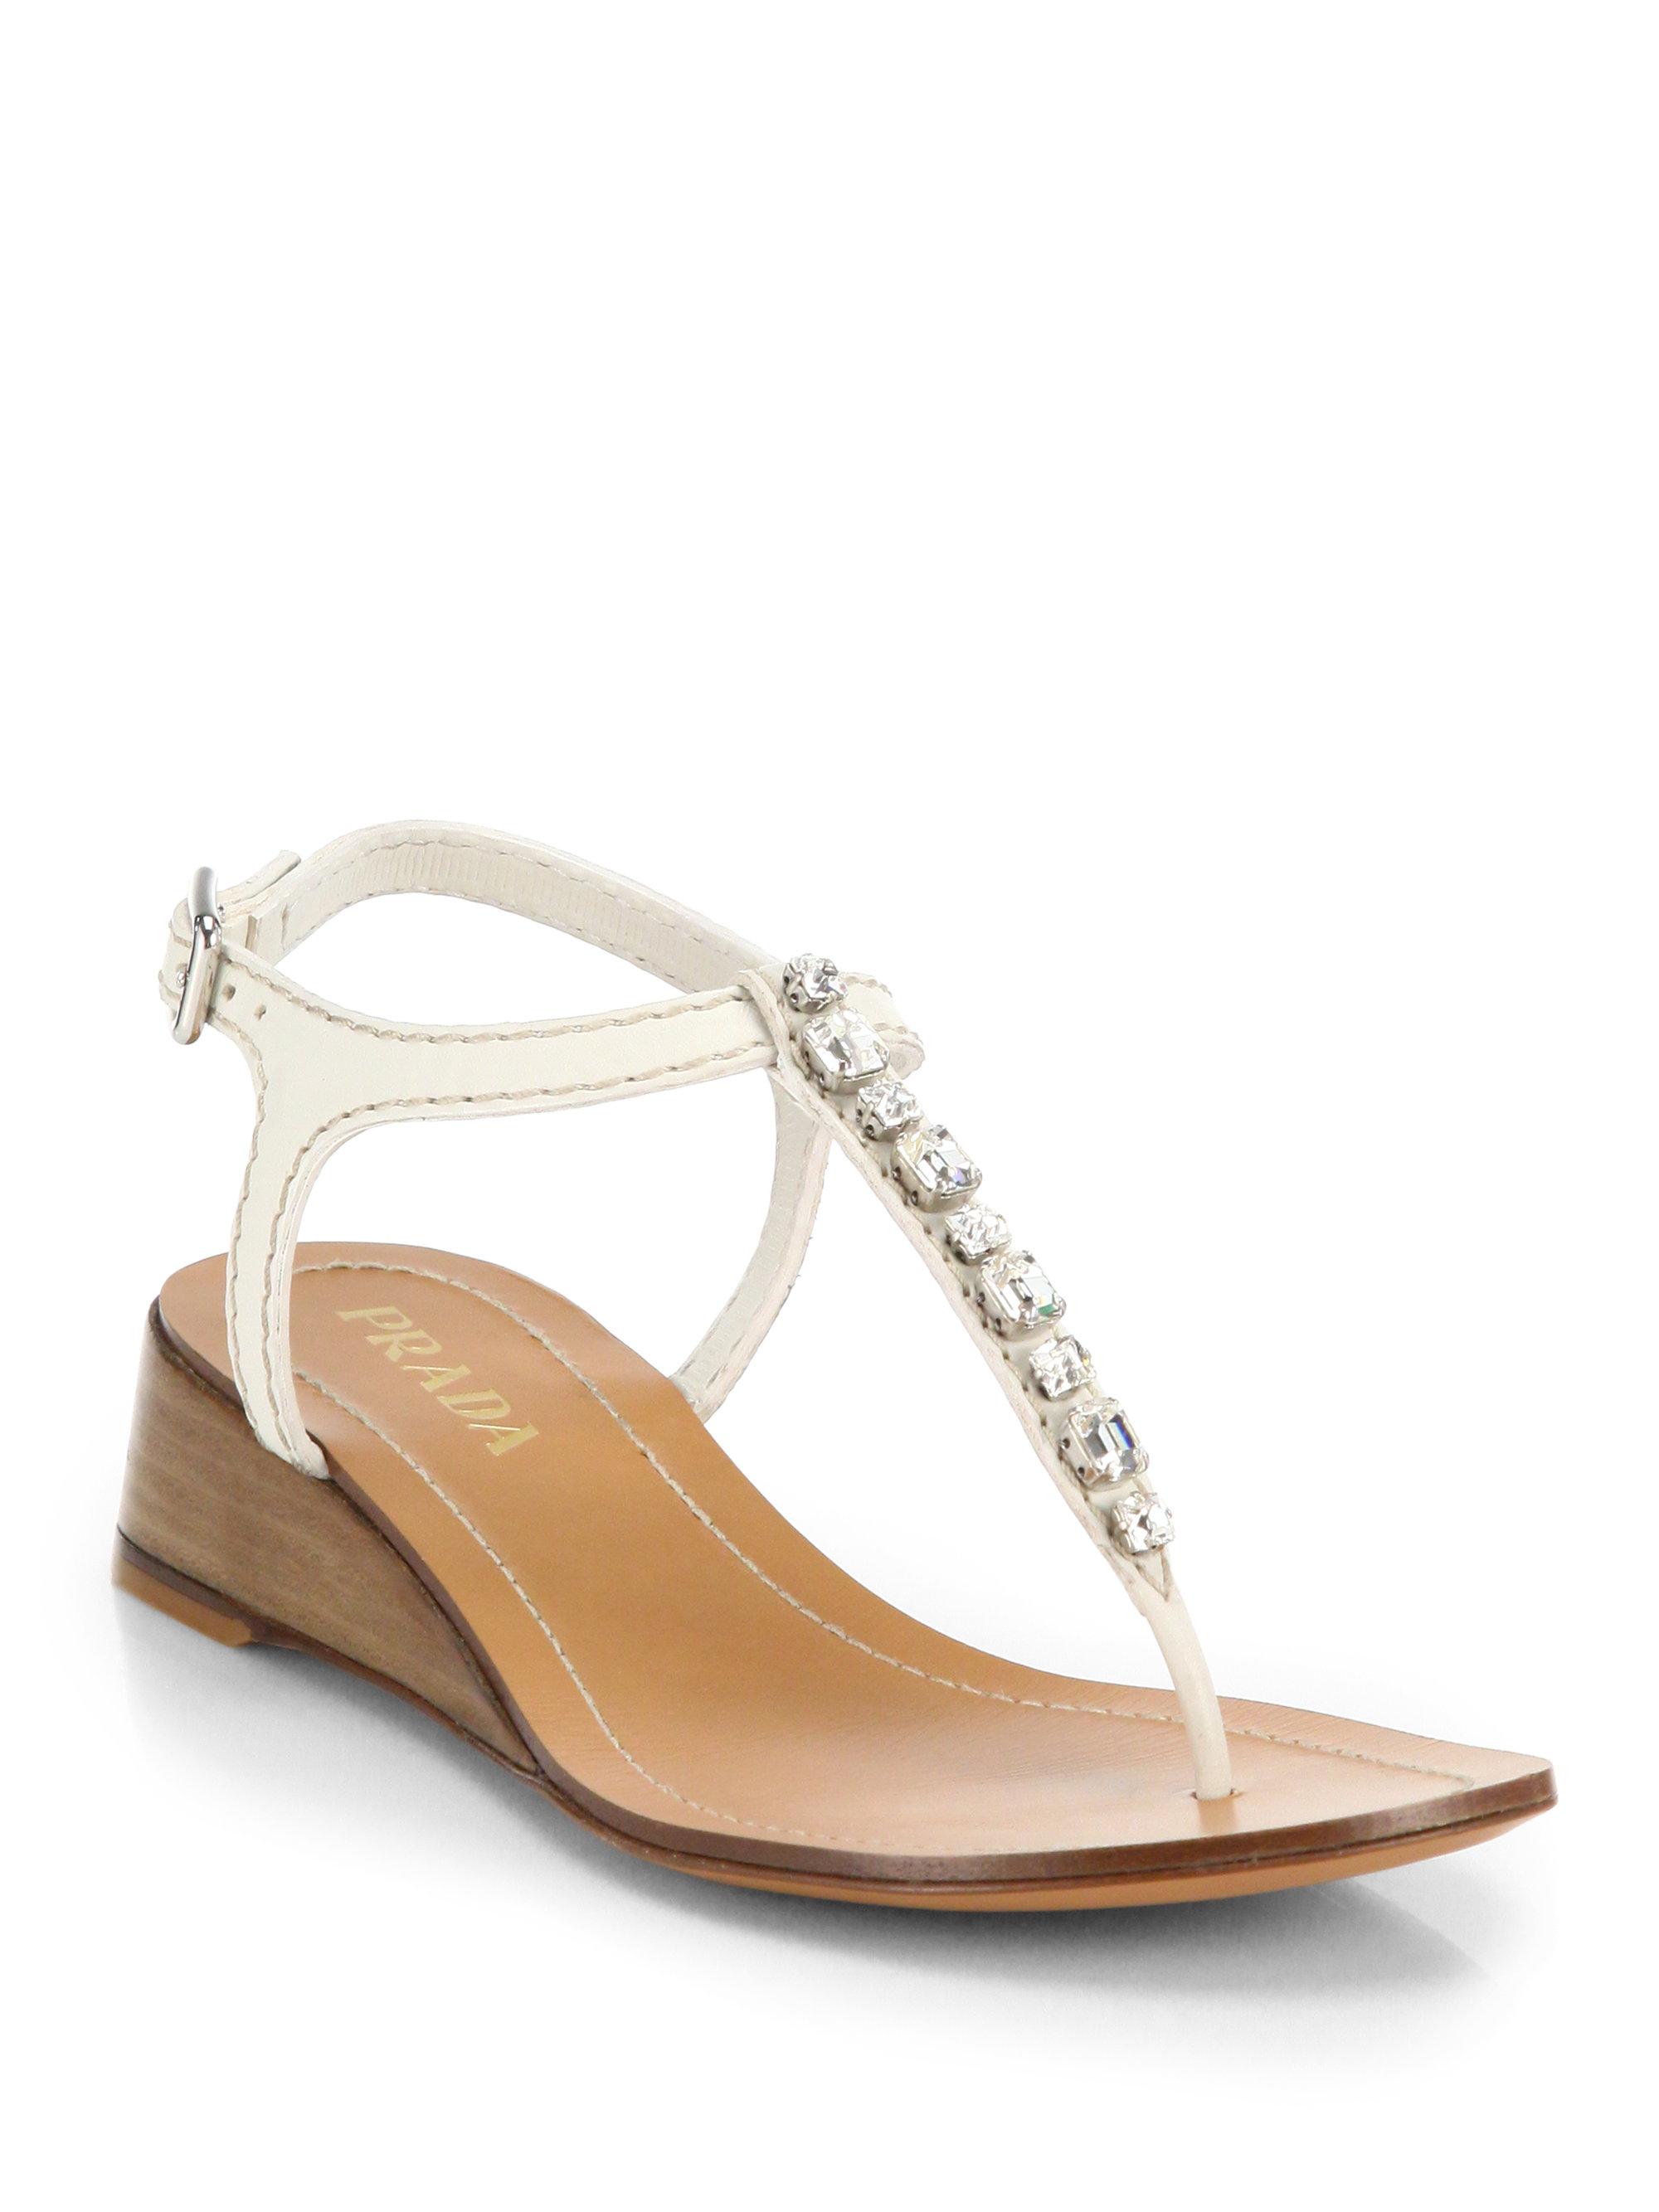 Prada Swarovski Crystal Leather Wedge Thong Sandals in ...